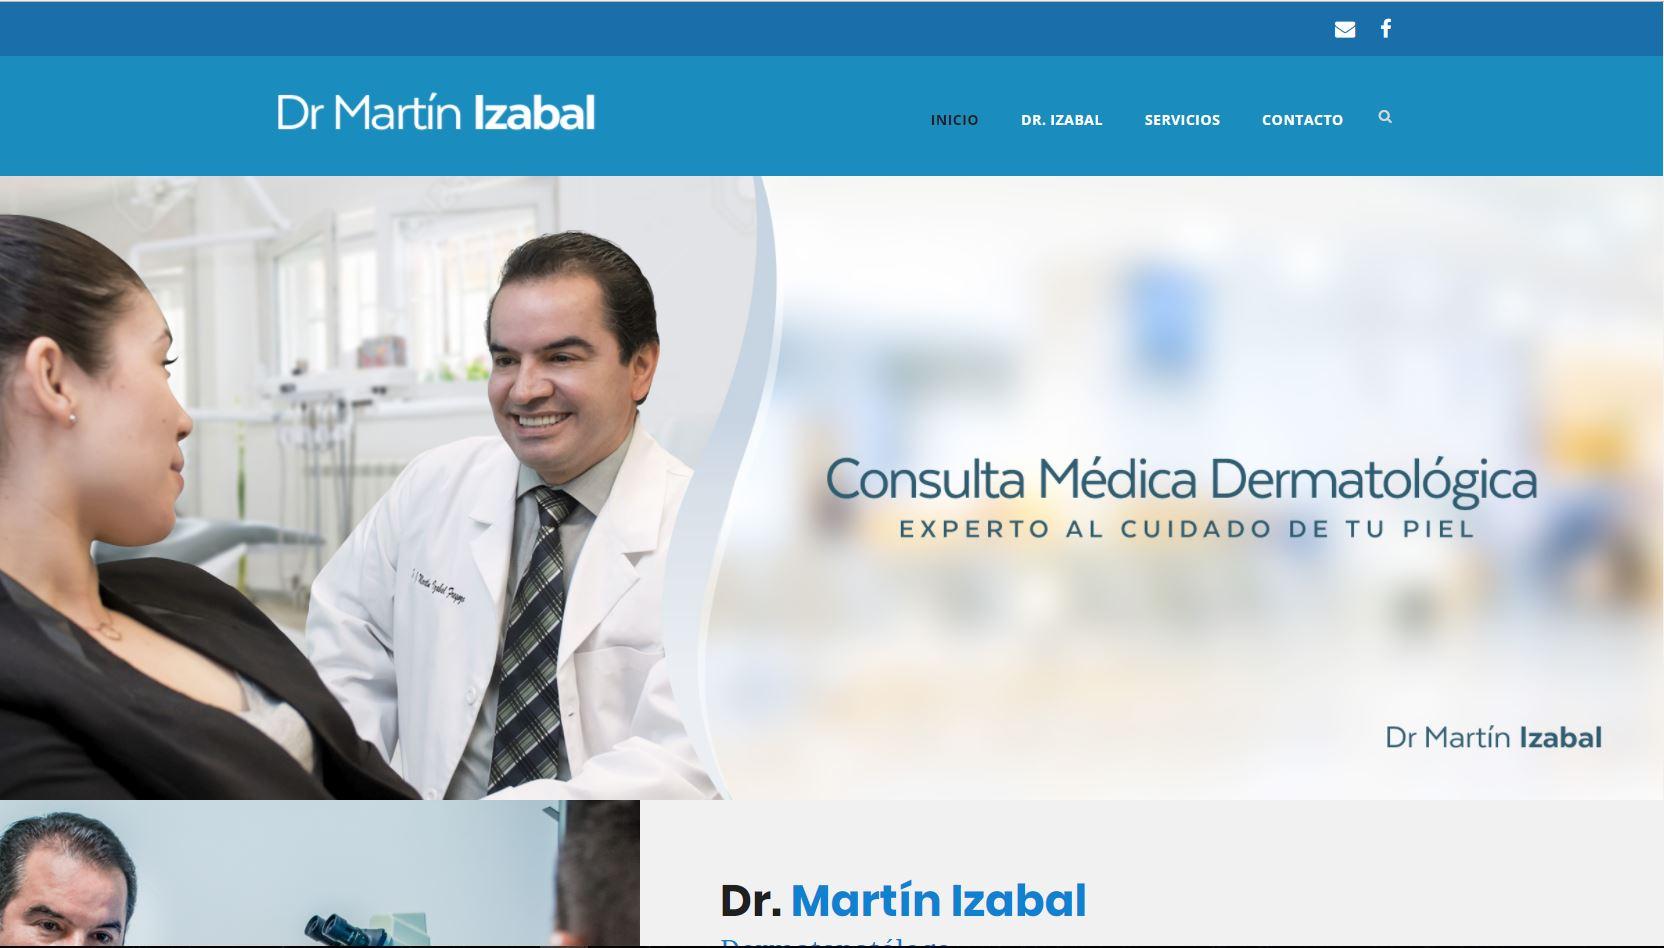 Dr. Martín Izabal